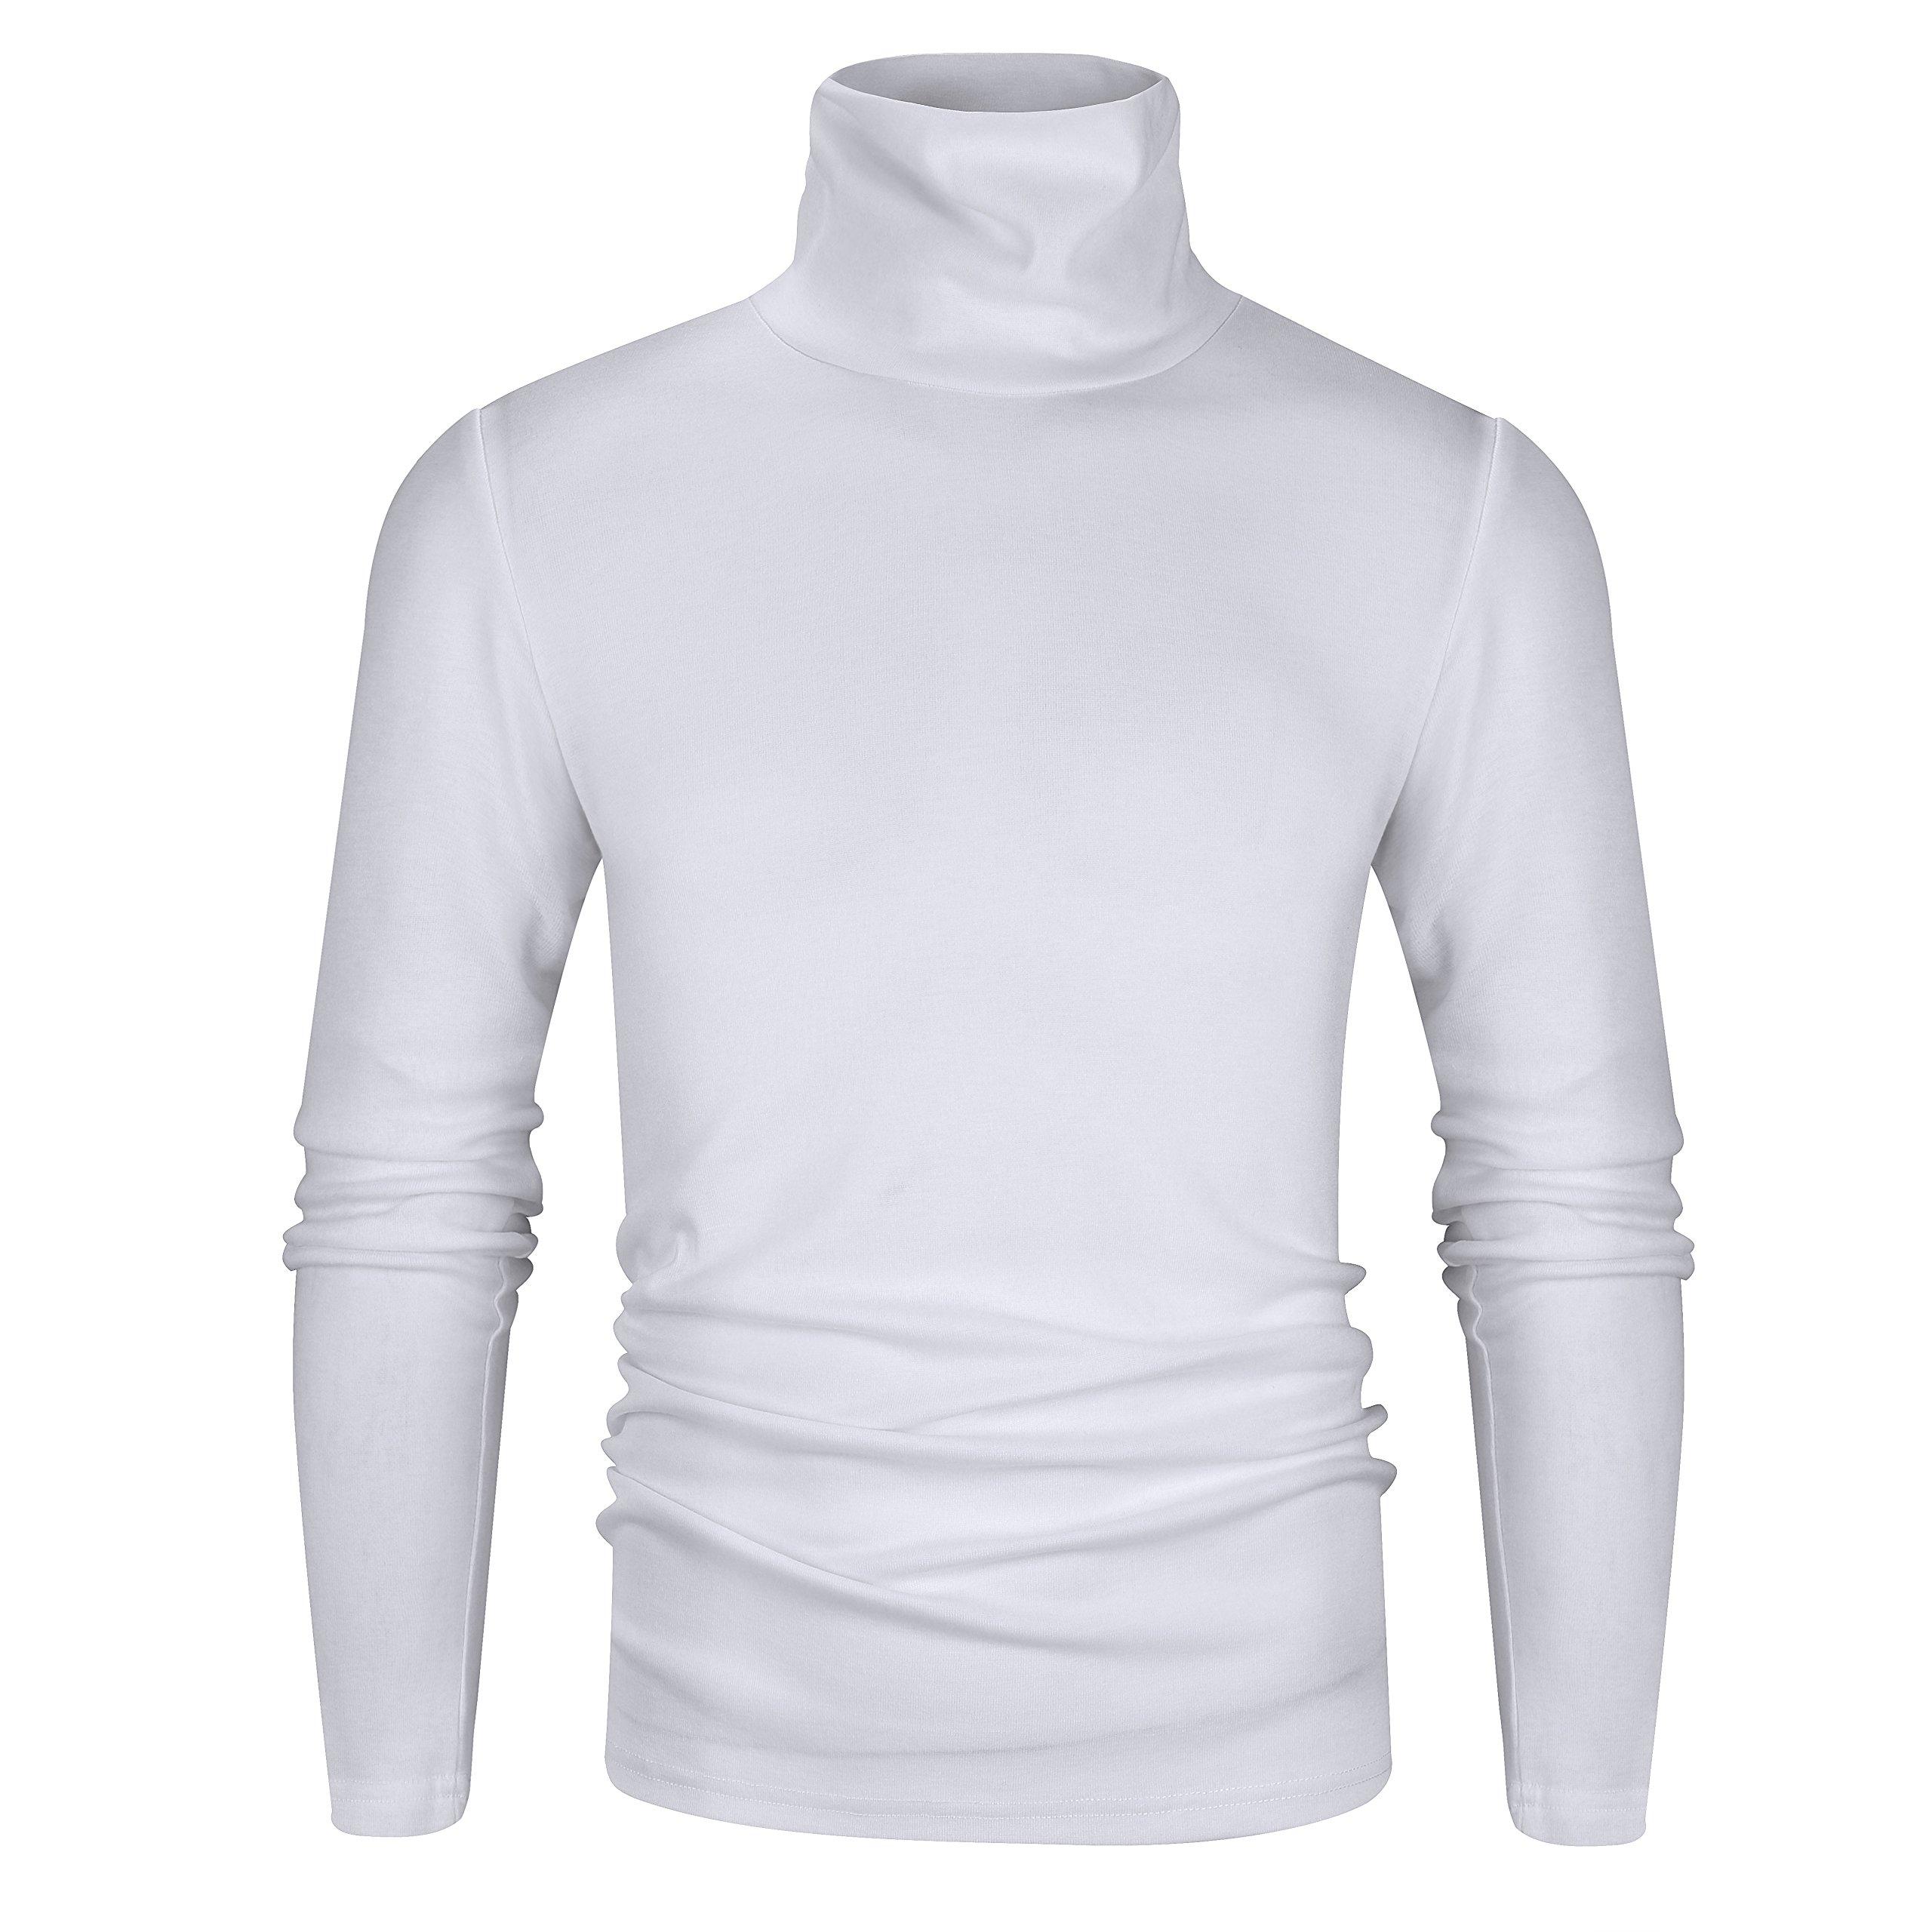 Derminpro Men's Thermal Turtleneck Soft Long Sleeve T-Shirt White X-Large